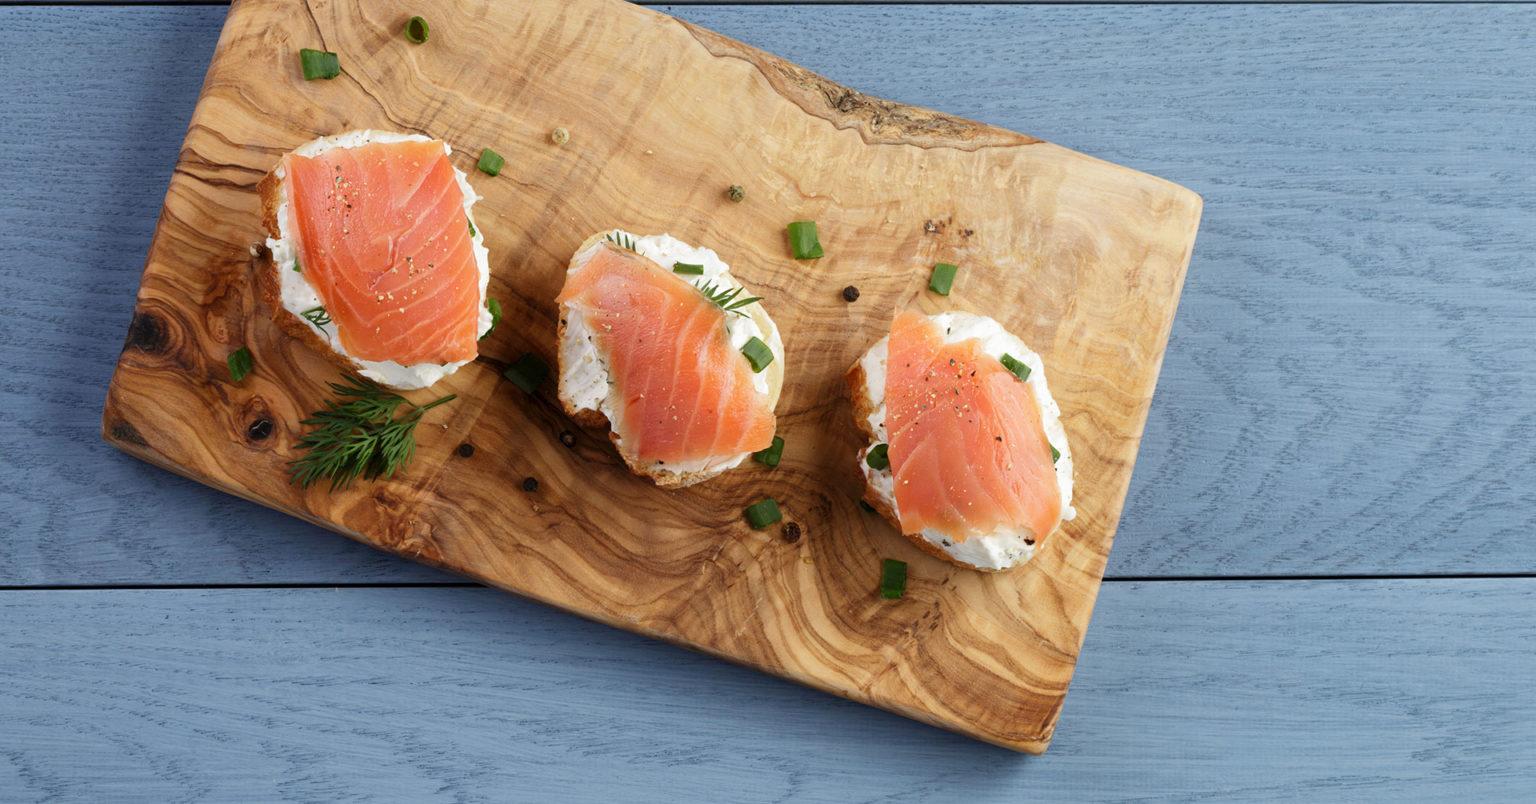 Canapés de queso azul y salmón ahumado